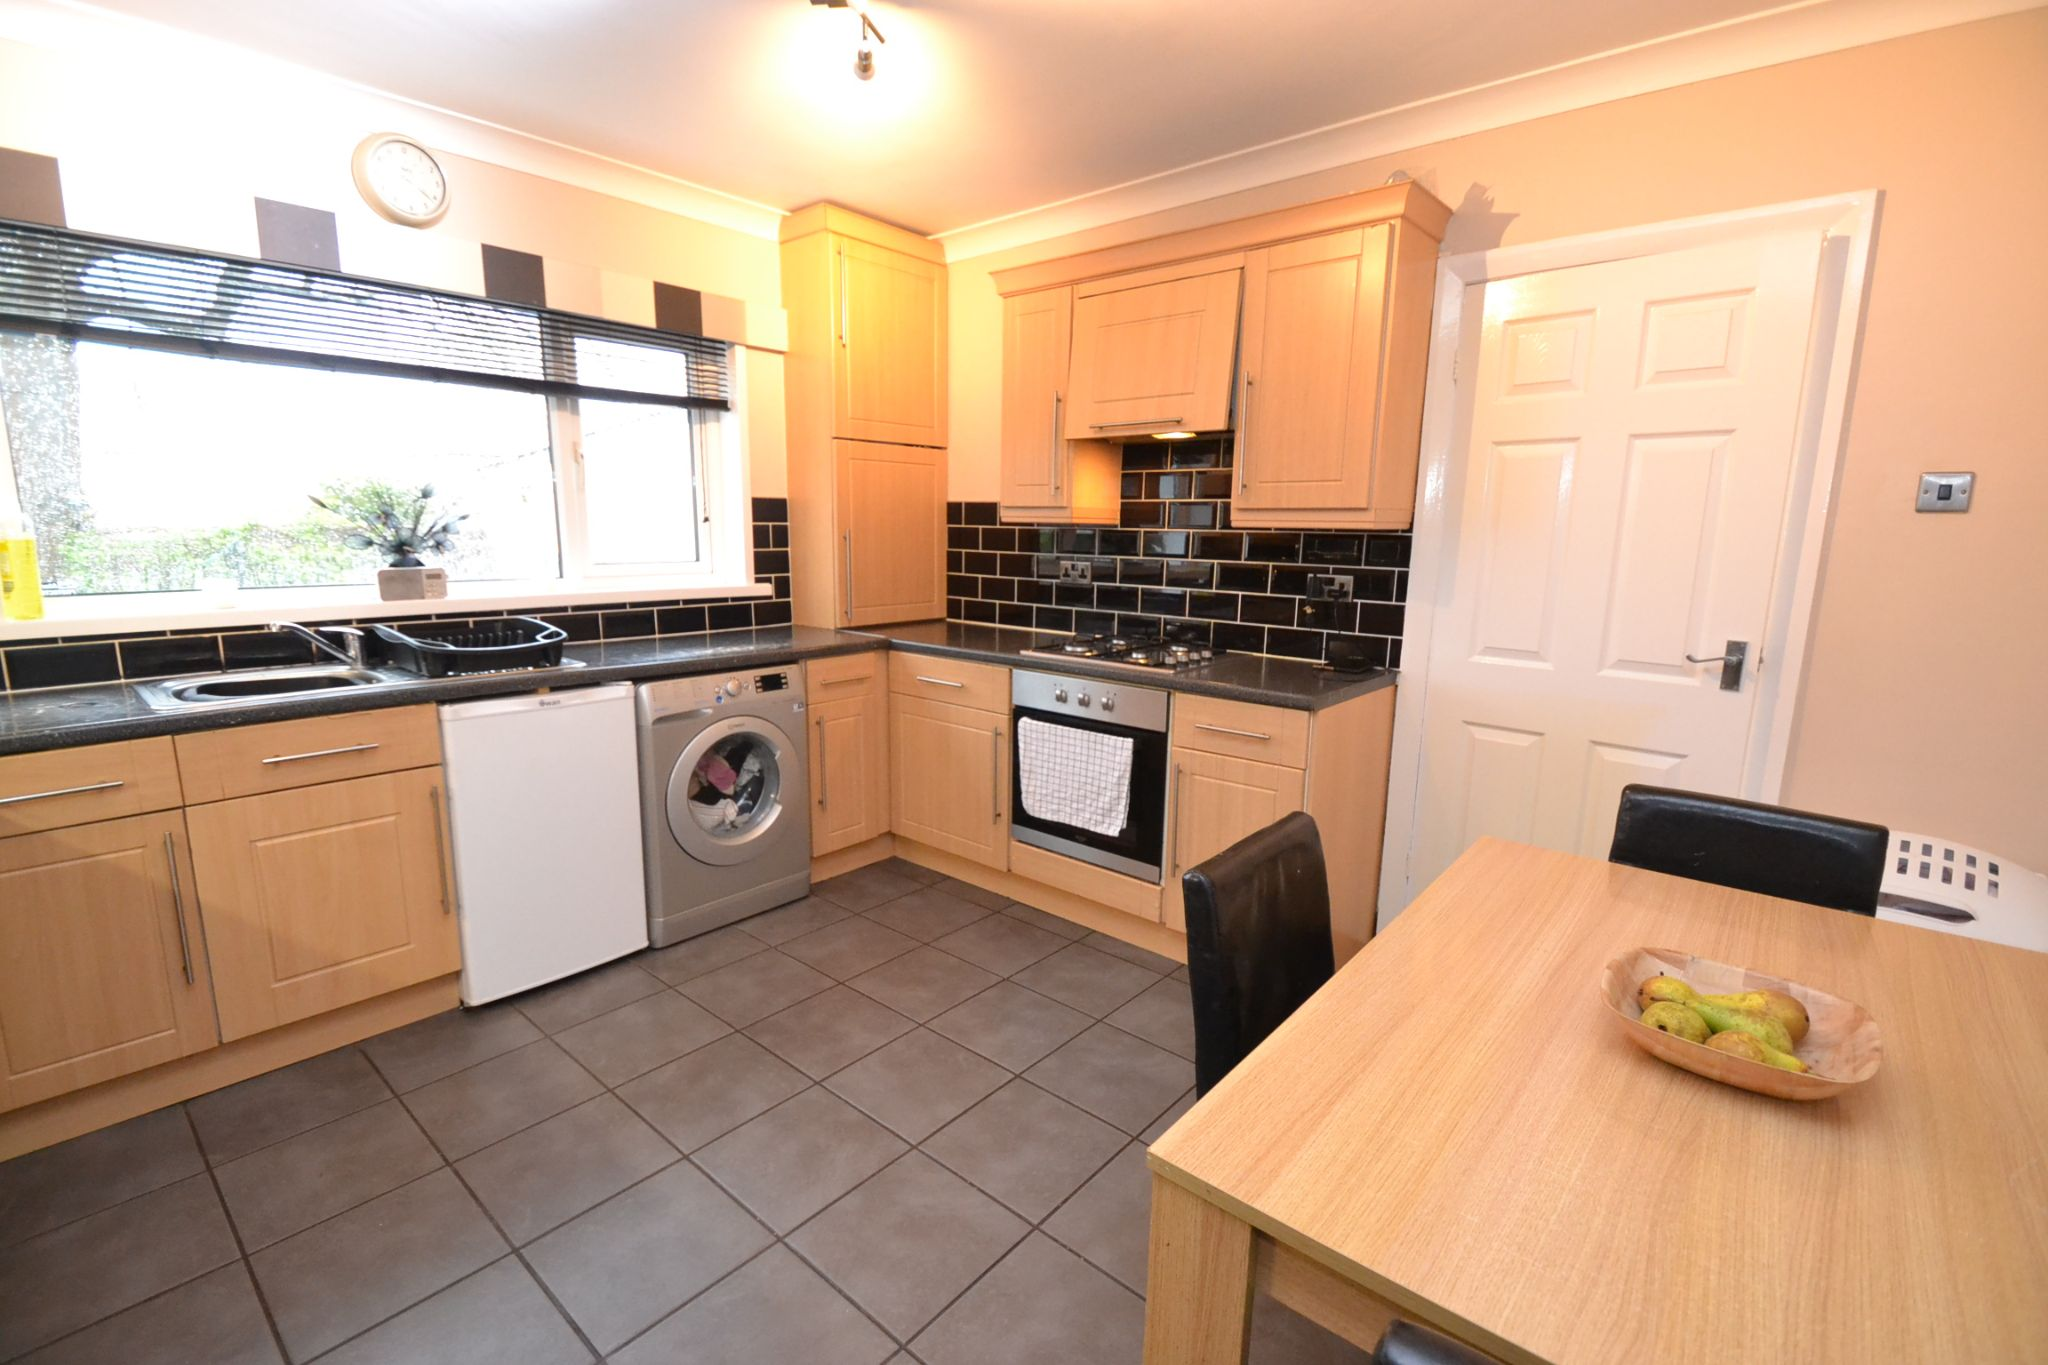 3 Bedroom Semi-detached Dormer House For Sale - Photograph 8